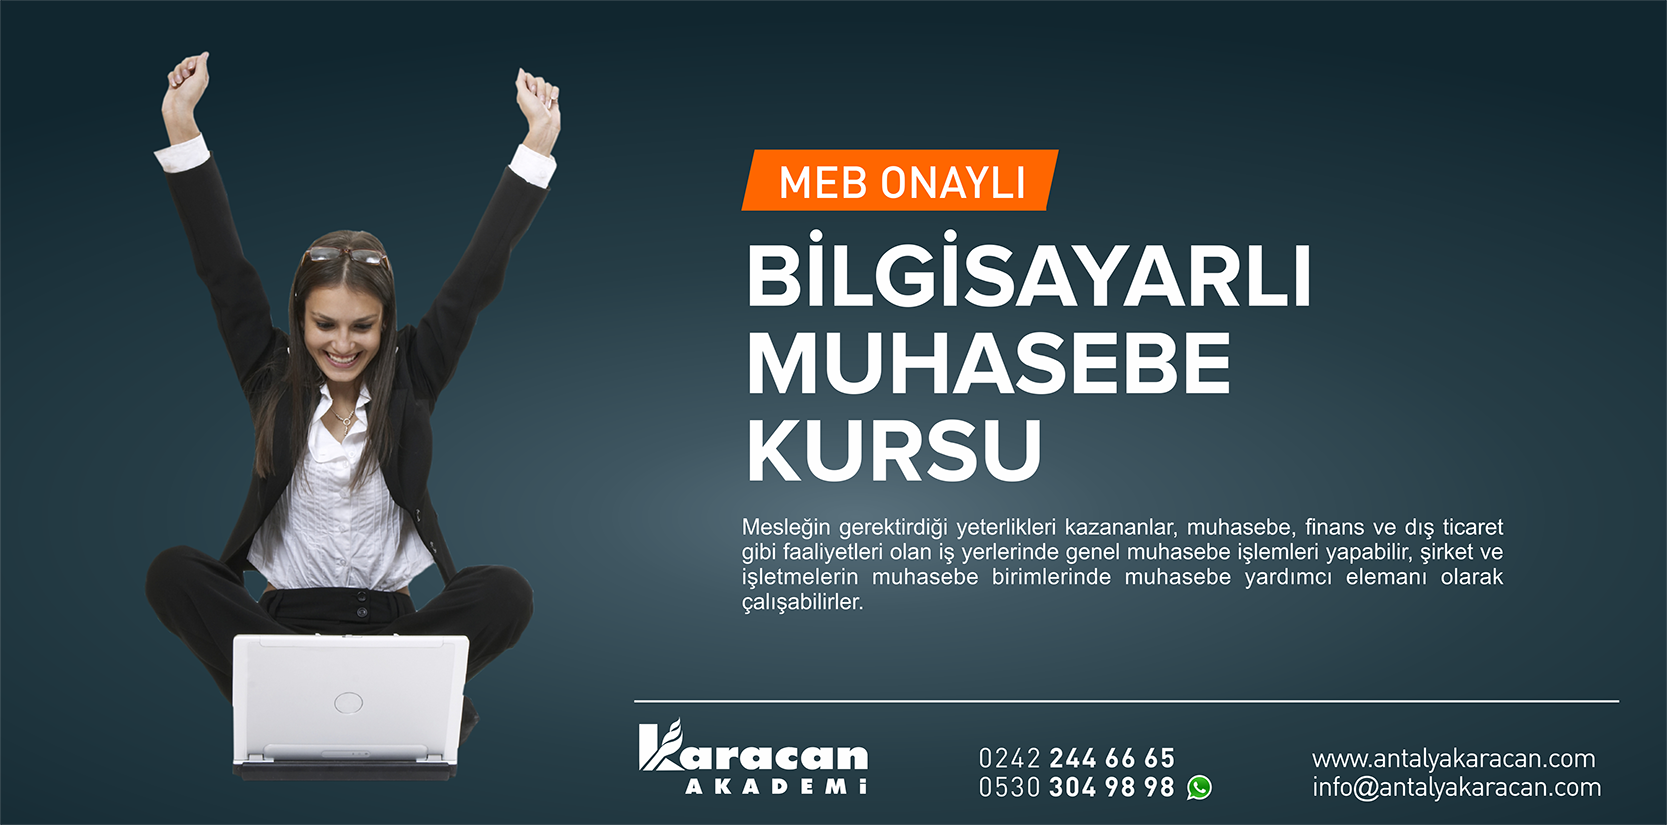 Antalya Bilgisayarlı Muhasebe Kursu